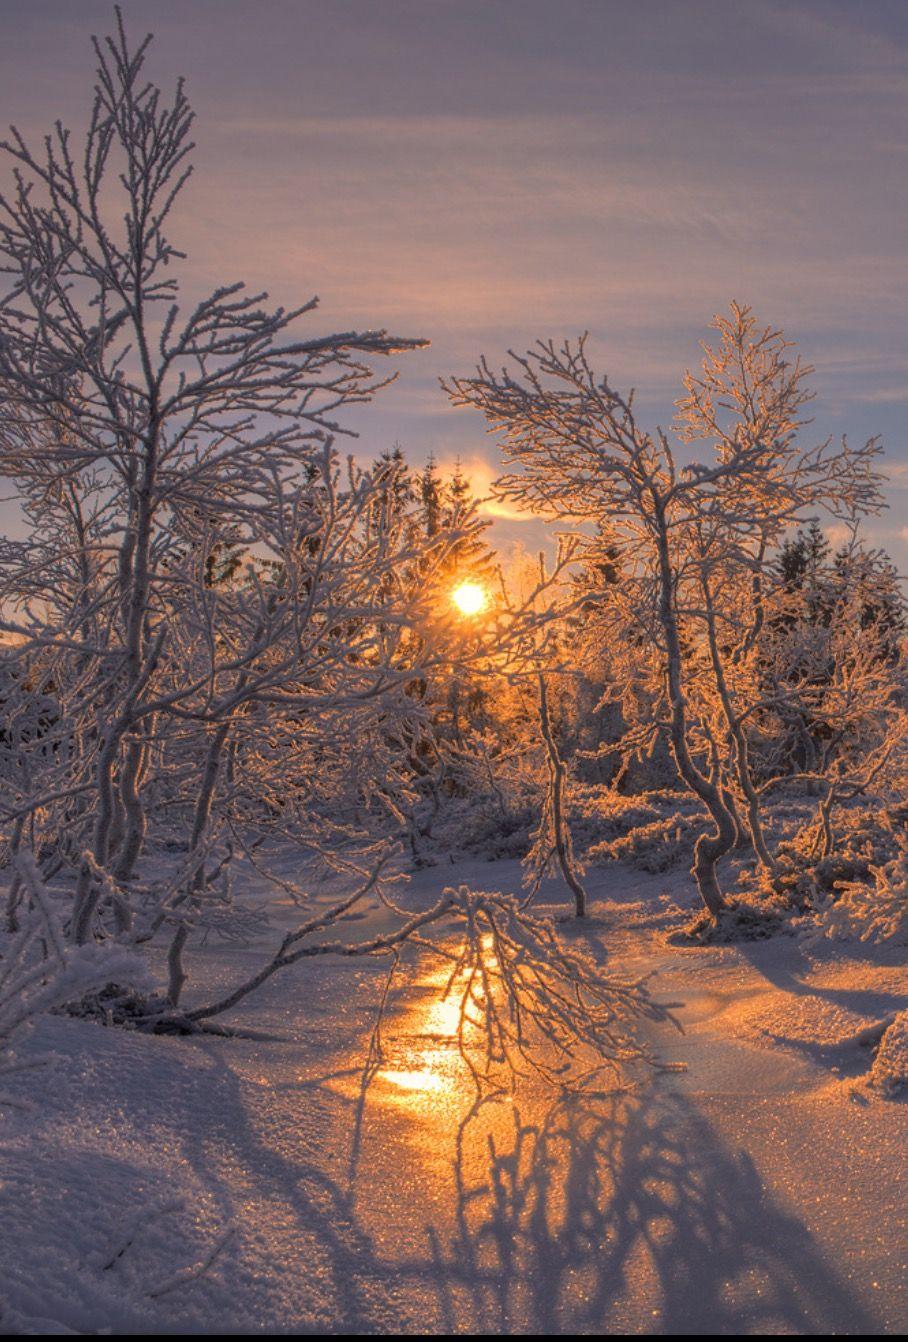 Winter sunrise in Norway. - title Frost - by Rune Askeland